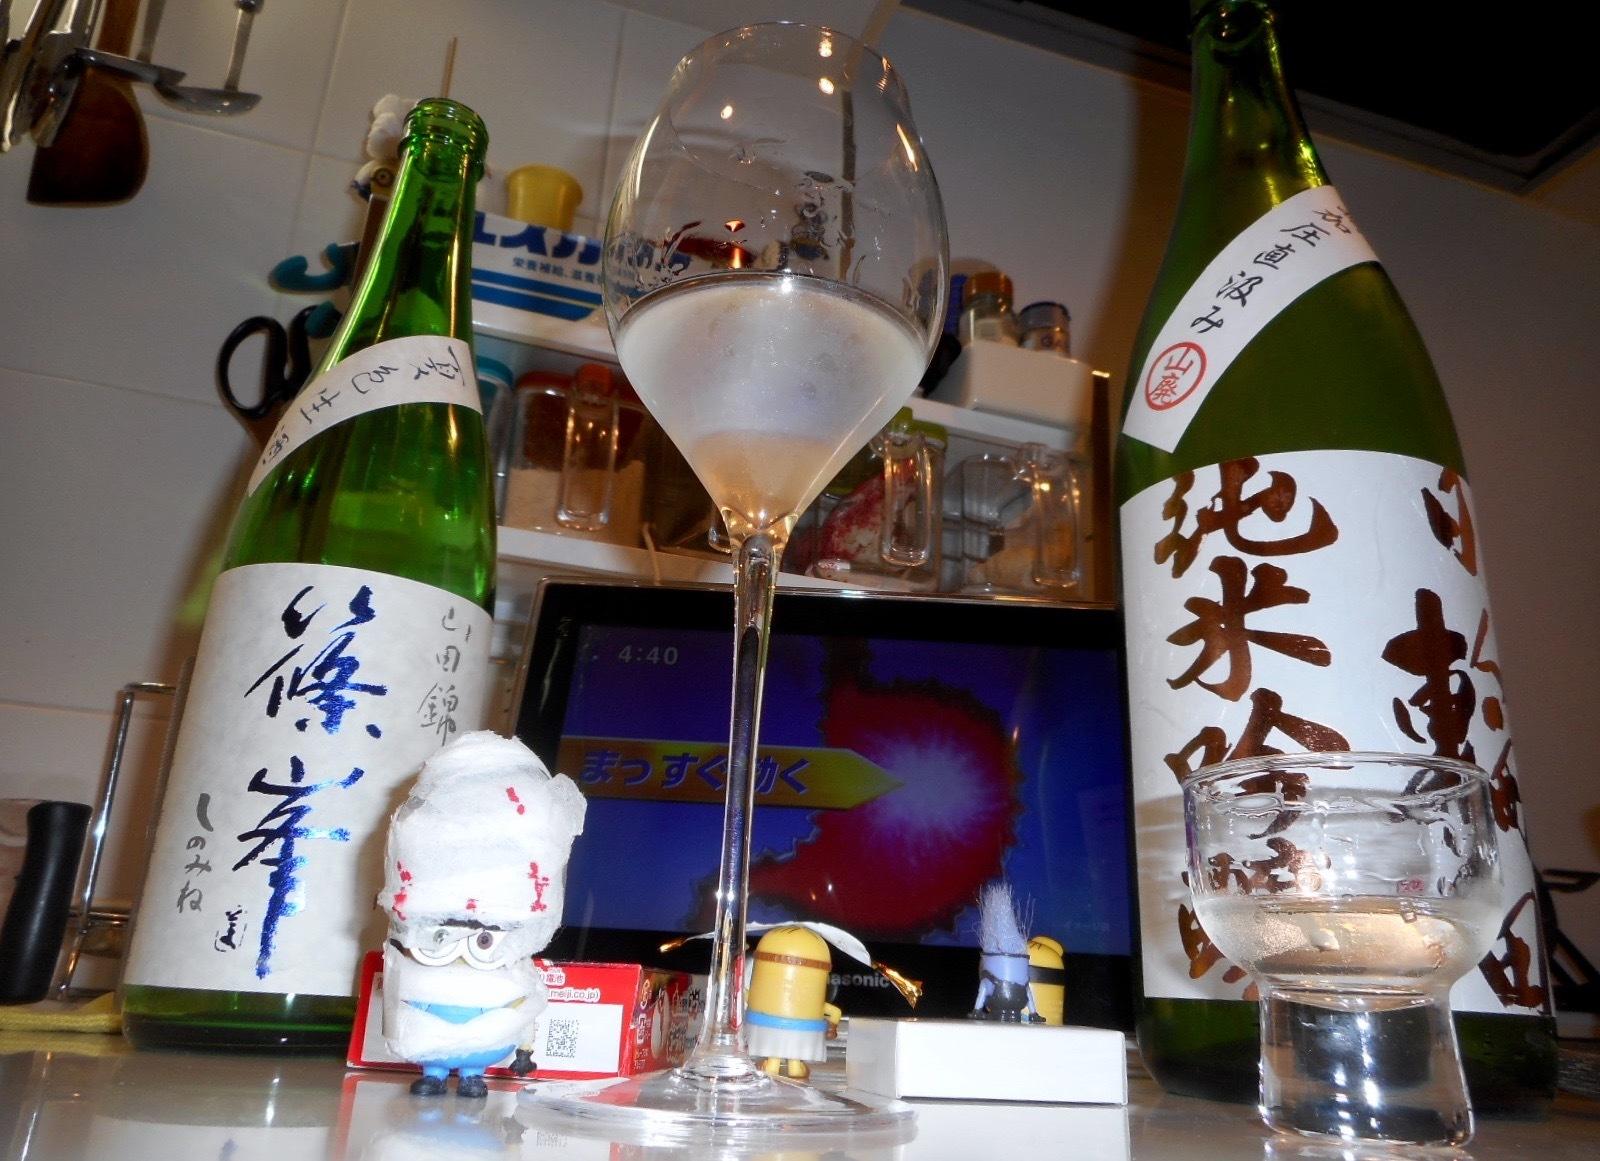 shinomine_sou_natsuiro28by13.jpg